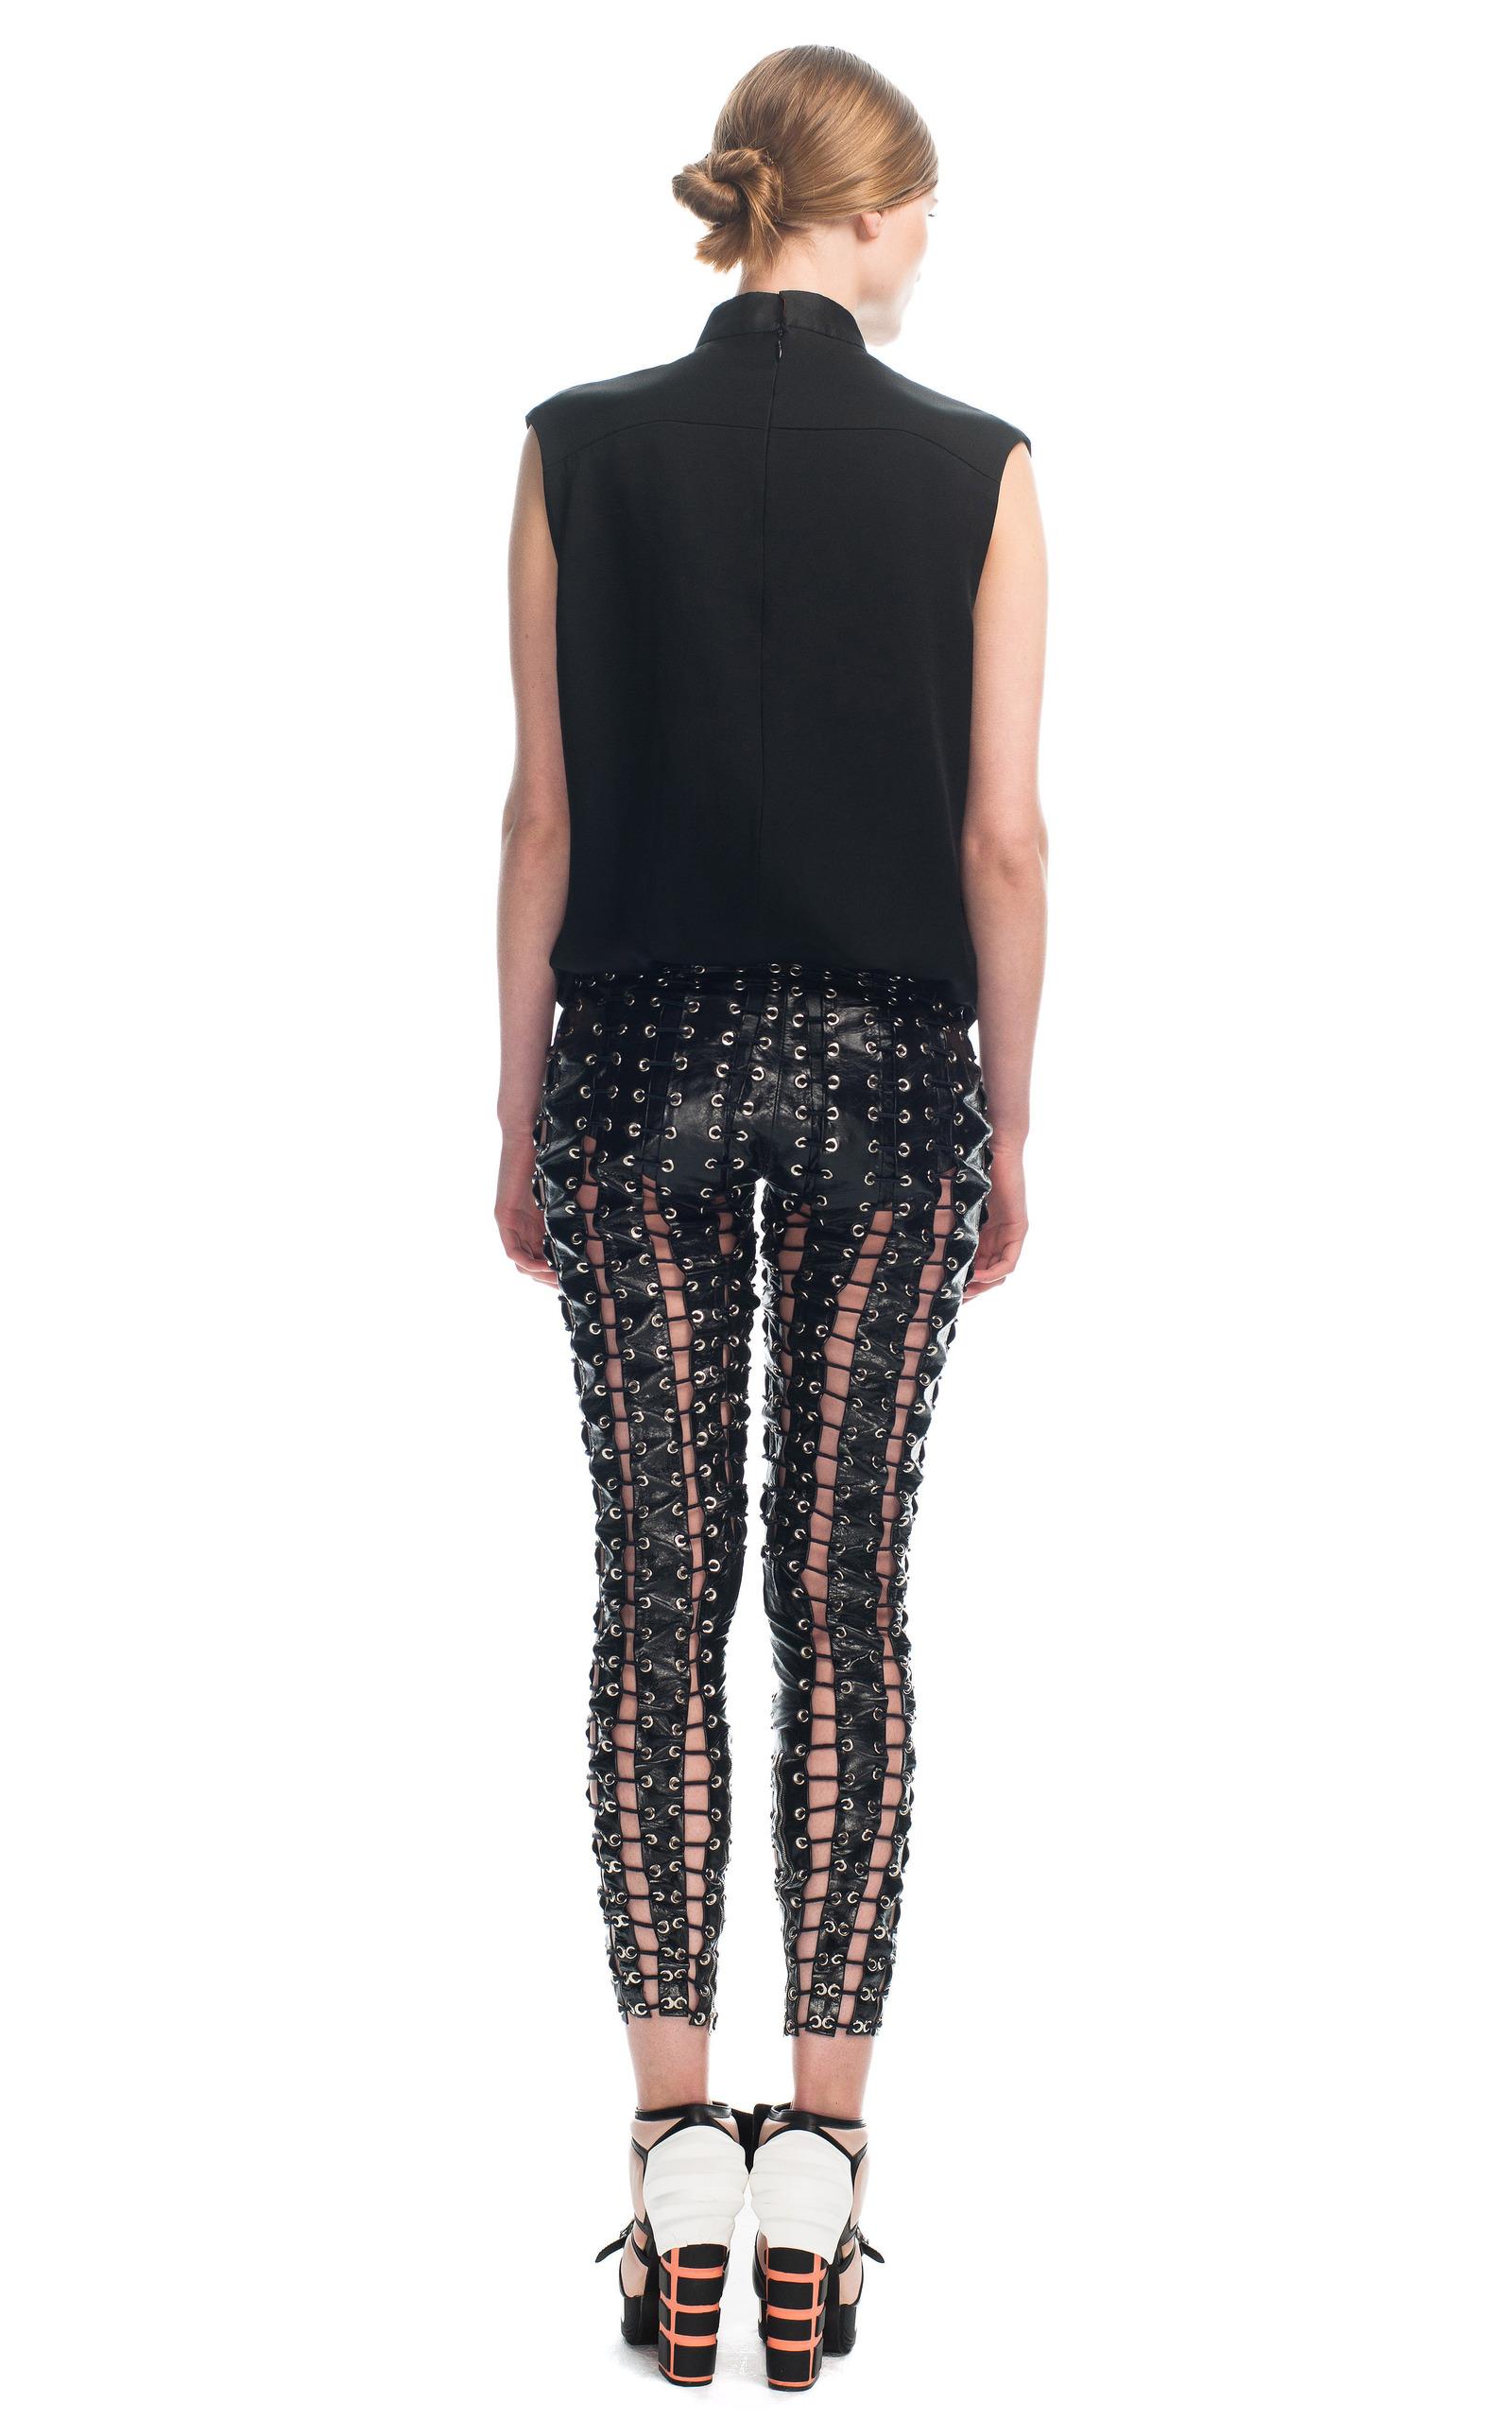 d3e40d8629714 Leather Grommeted Lace Up Pants by Rodarte | Moda Operandi